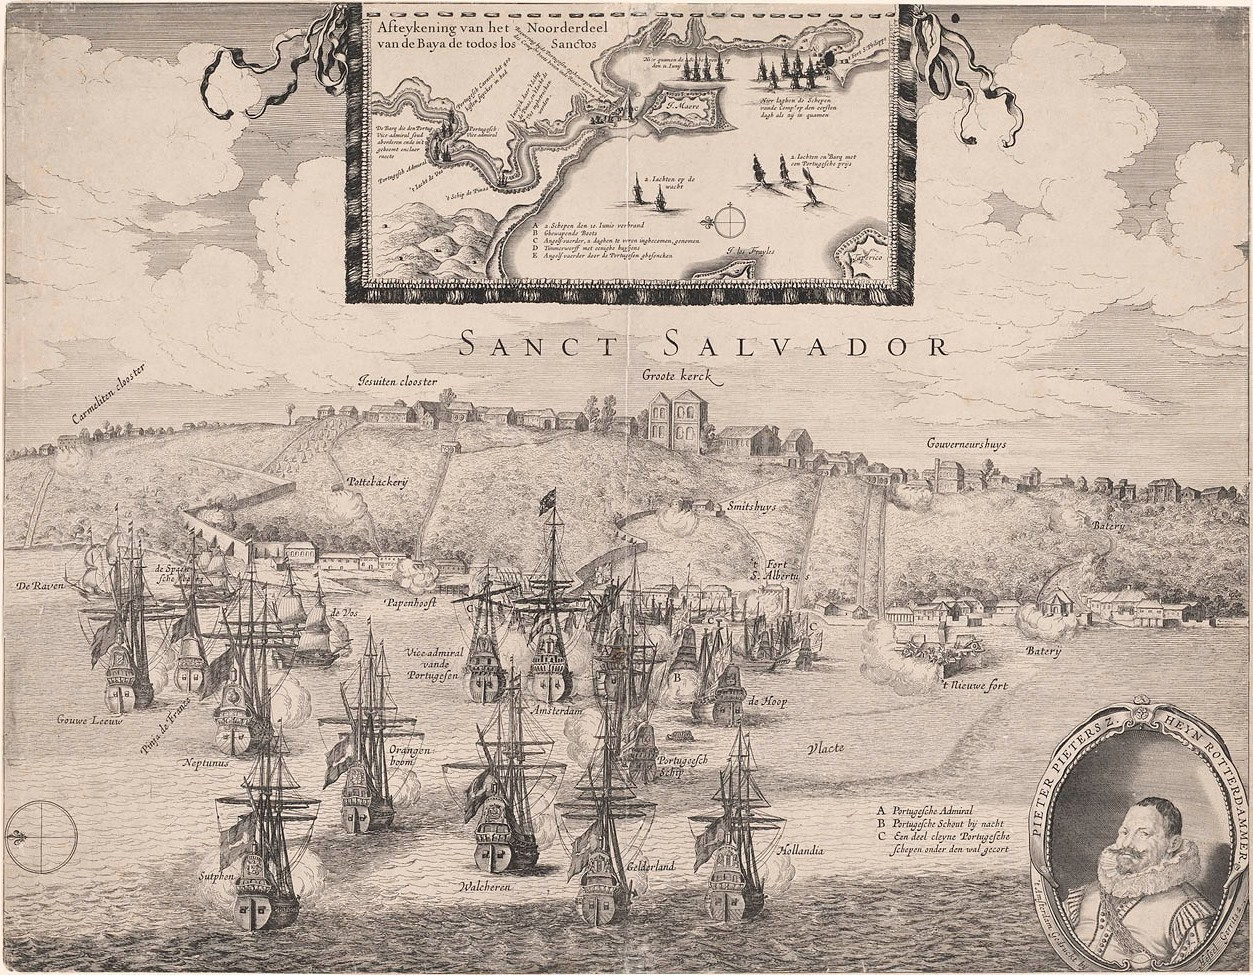 Desenho de Hassel Gerritsz sobre a Baía de Todos os Santos durante a invasão holandesa